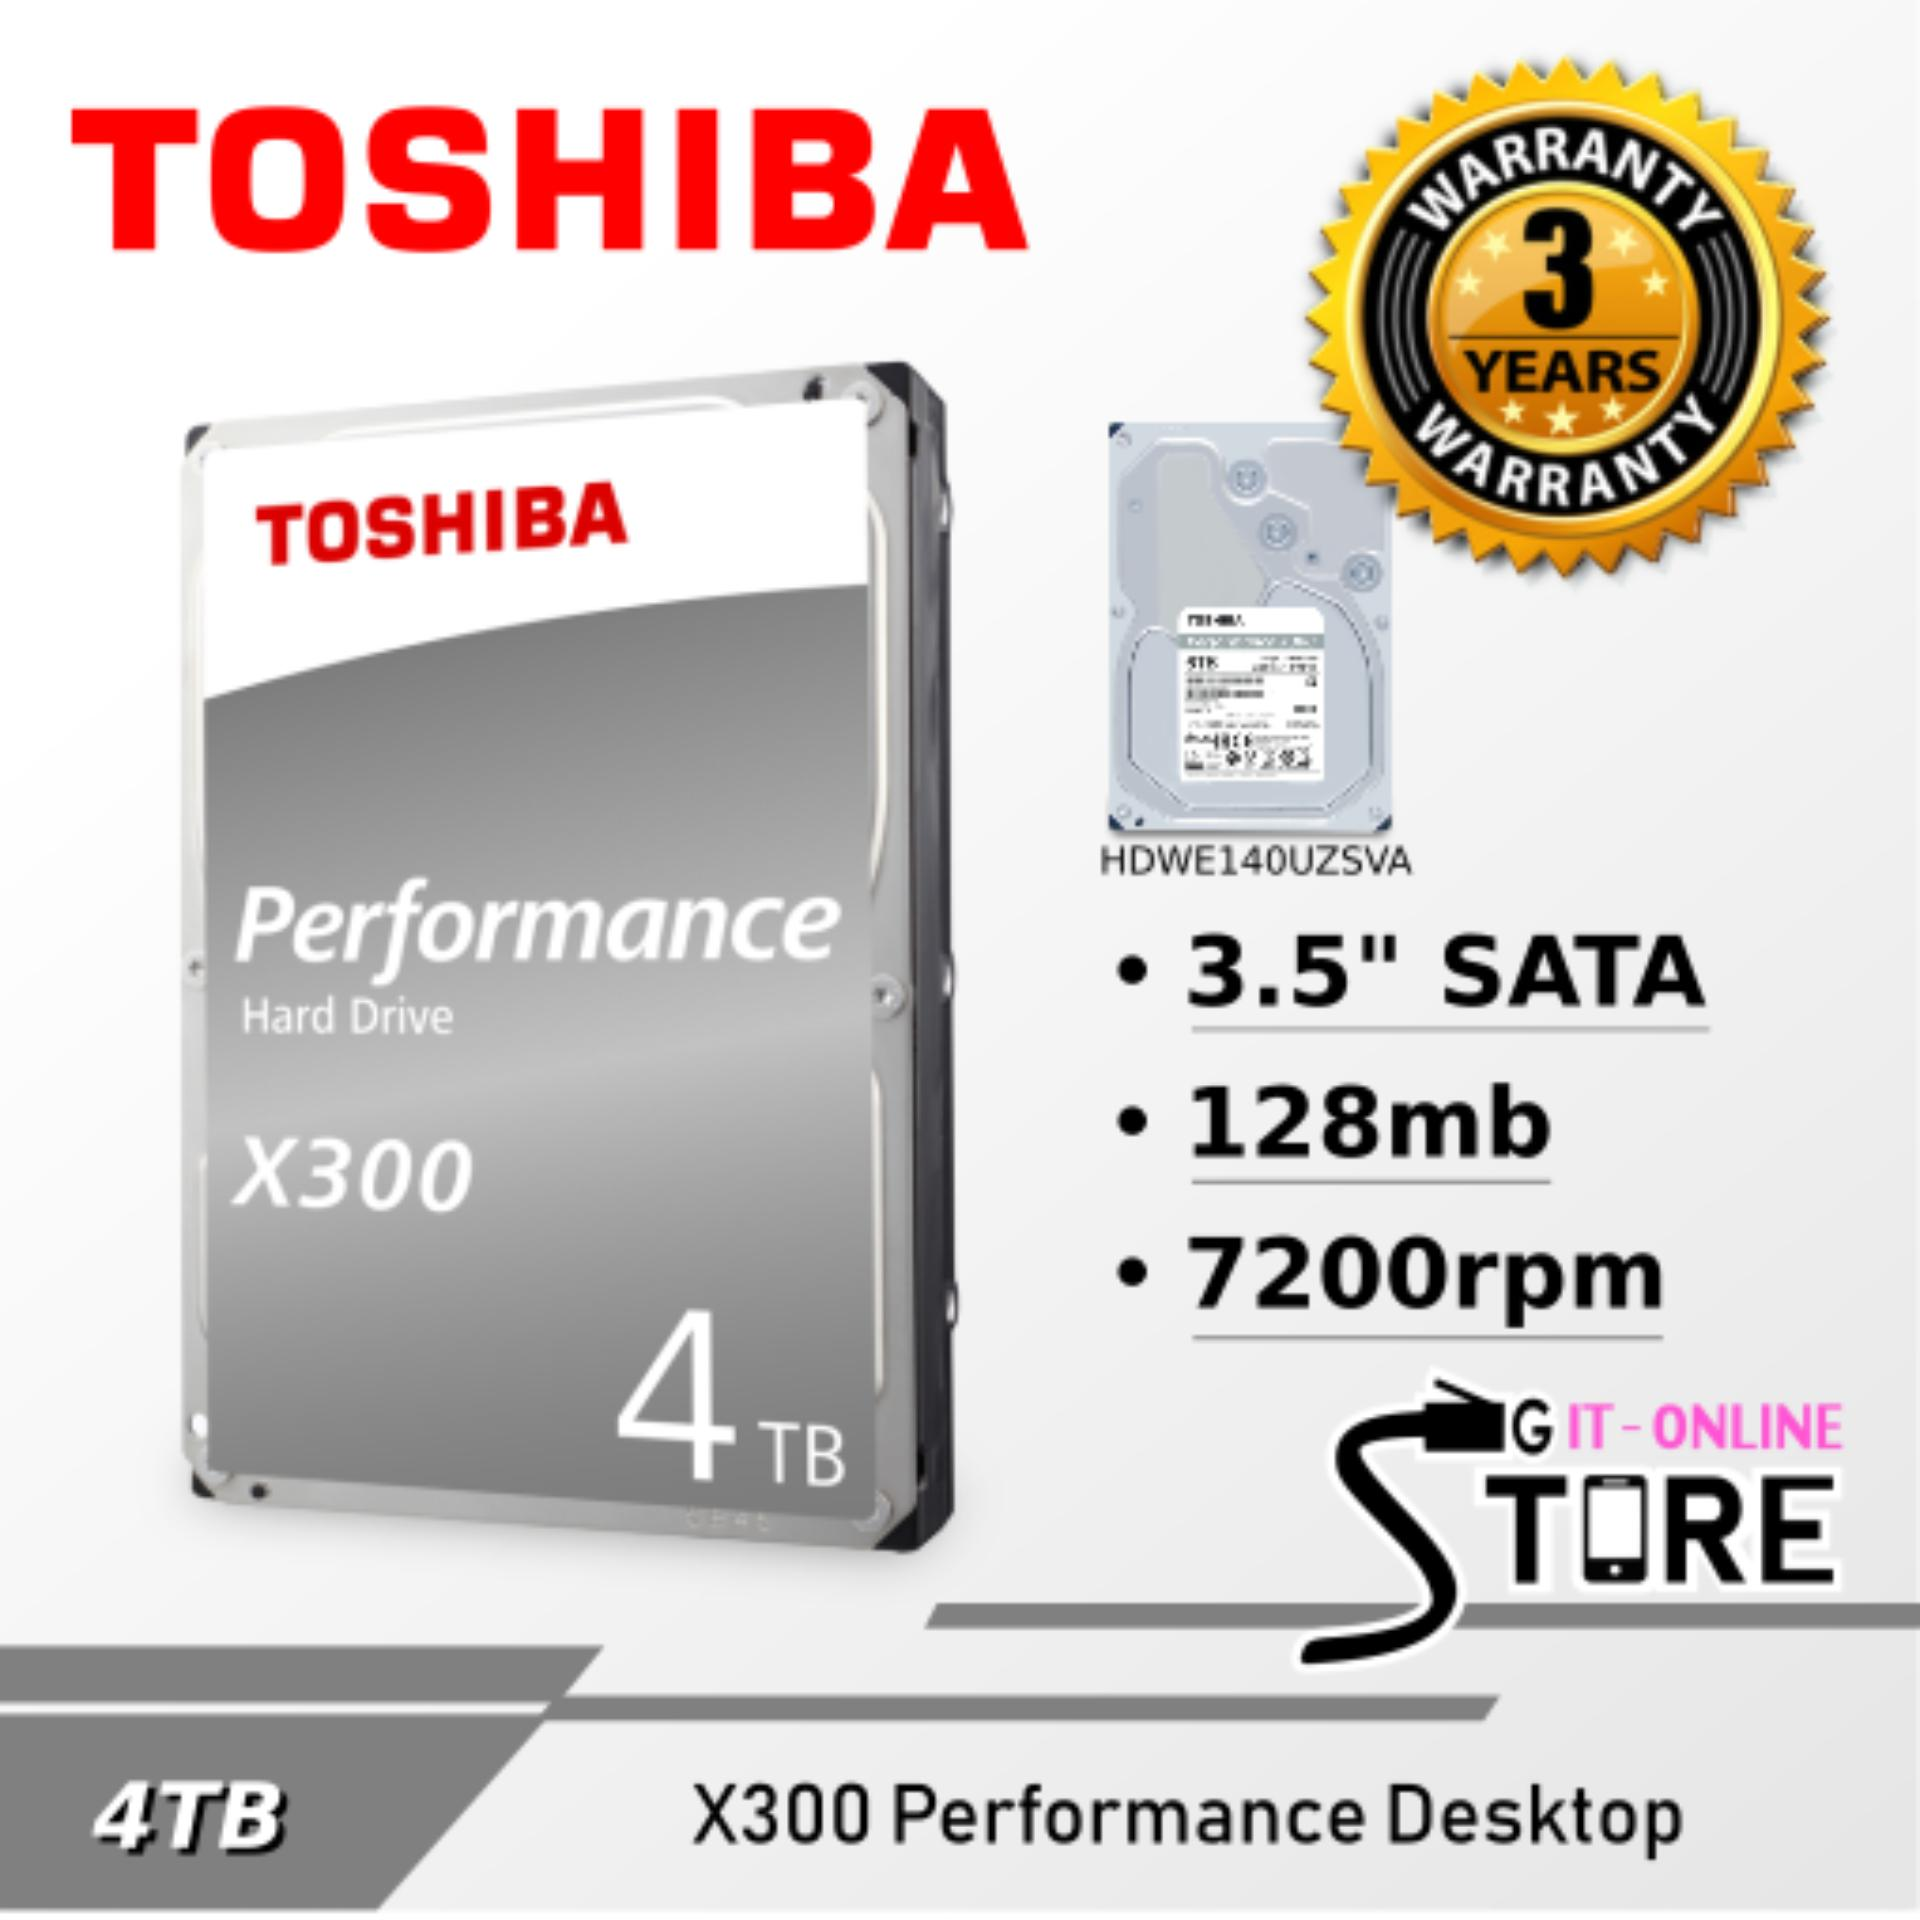 Buy Internal Hard Drives Disk Usb Lazada Hardisk 25 120gb Toshiba Hitachi Performance X300 Hdd 4tb